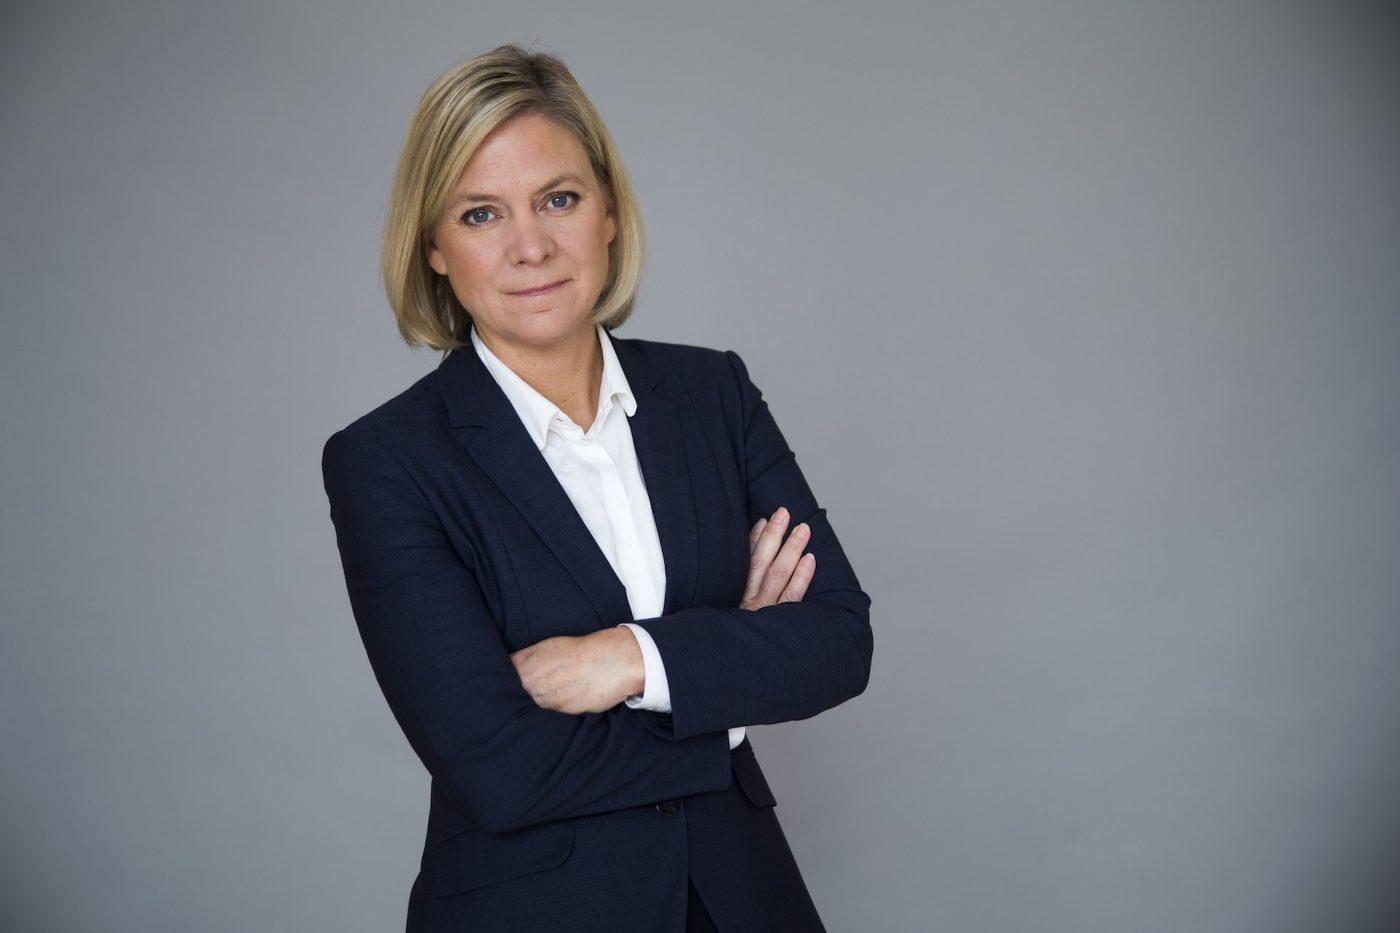 Magdalena Andersson Coronaviruset